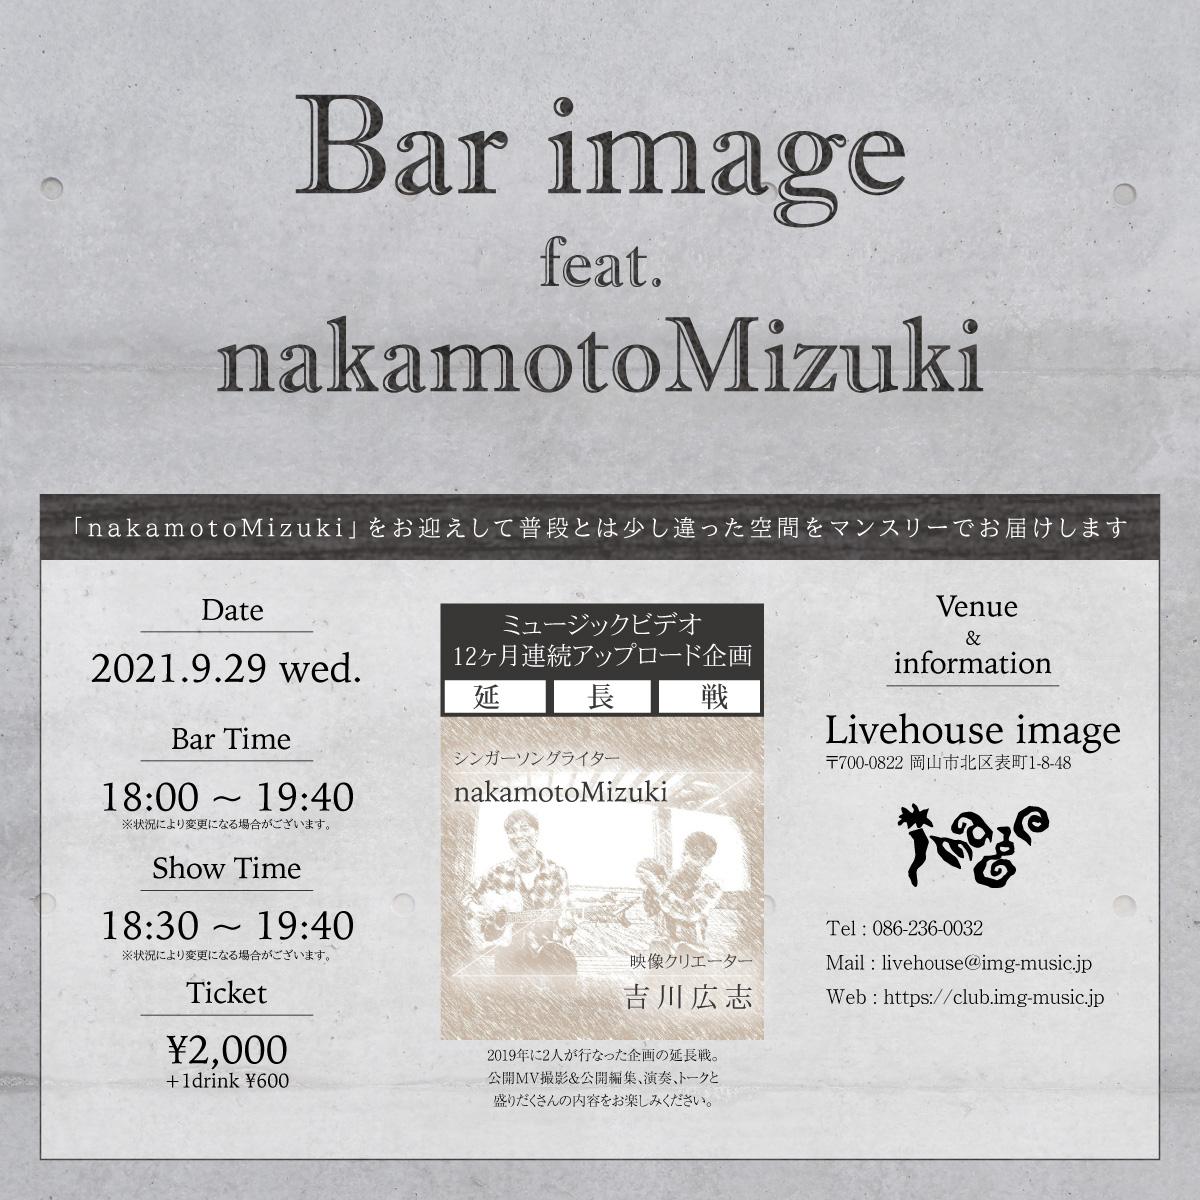 Bar image feat. nakamotoMizuki